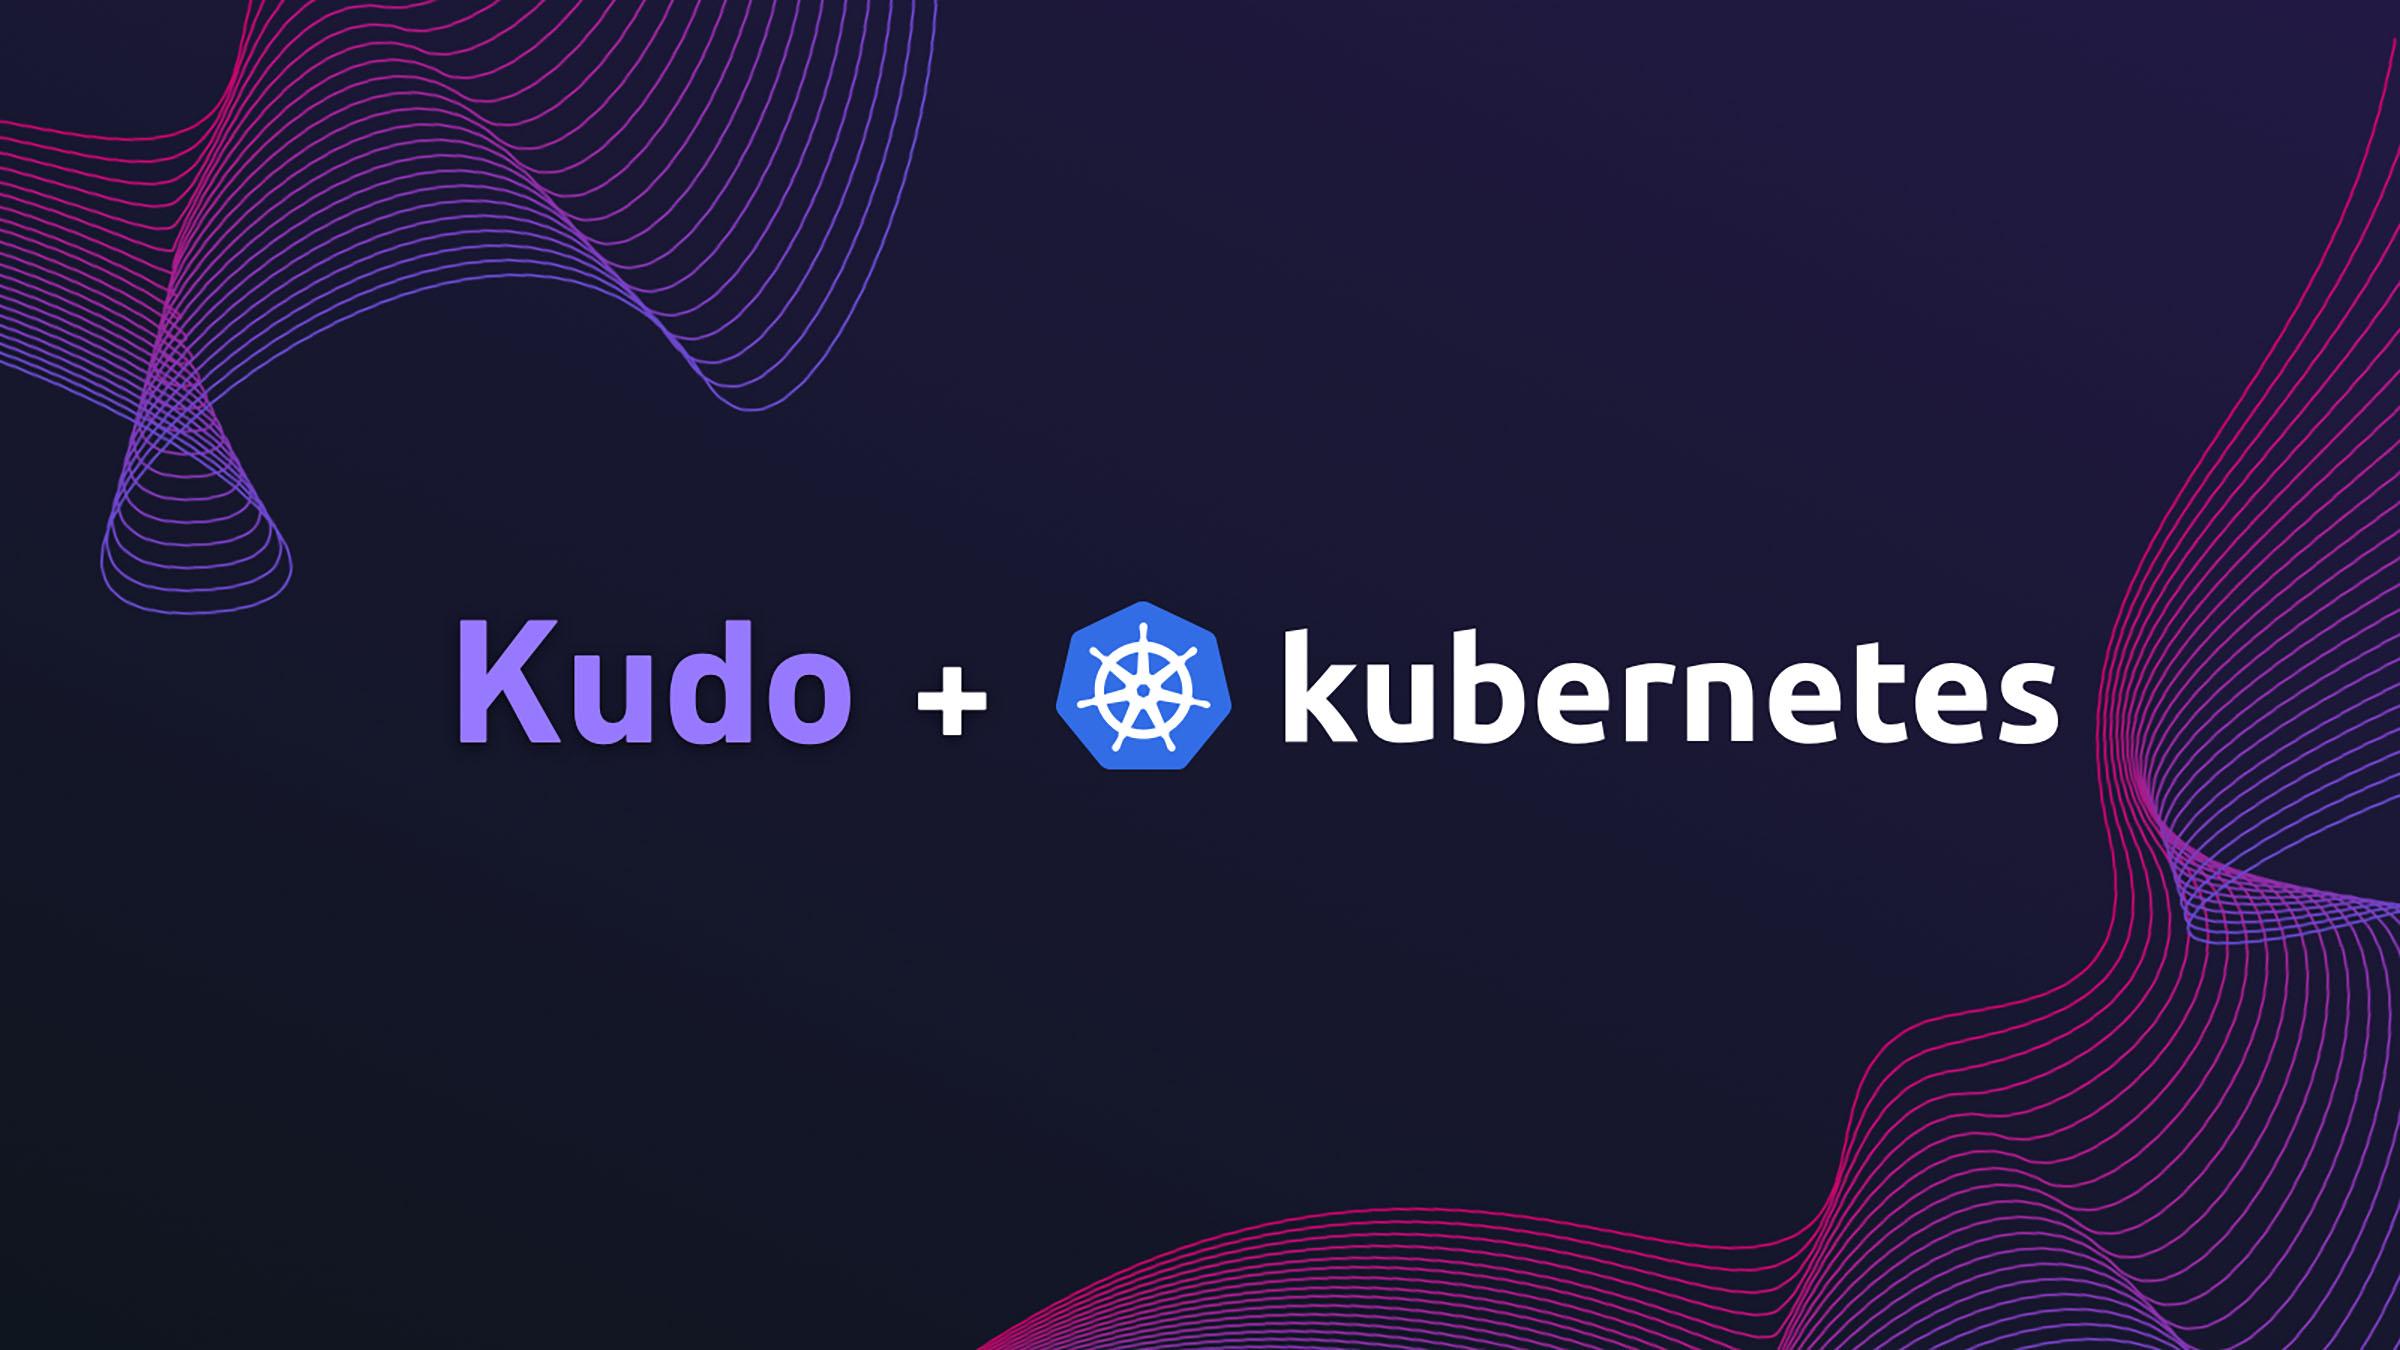 Announcing Kudo - A declarative, no-code approach to